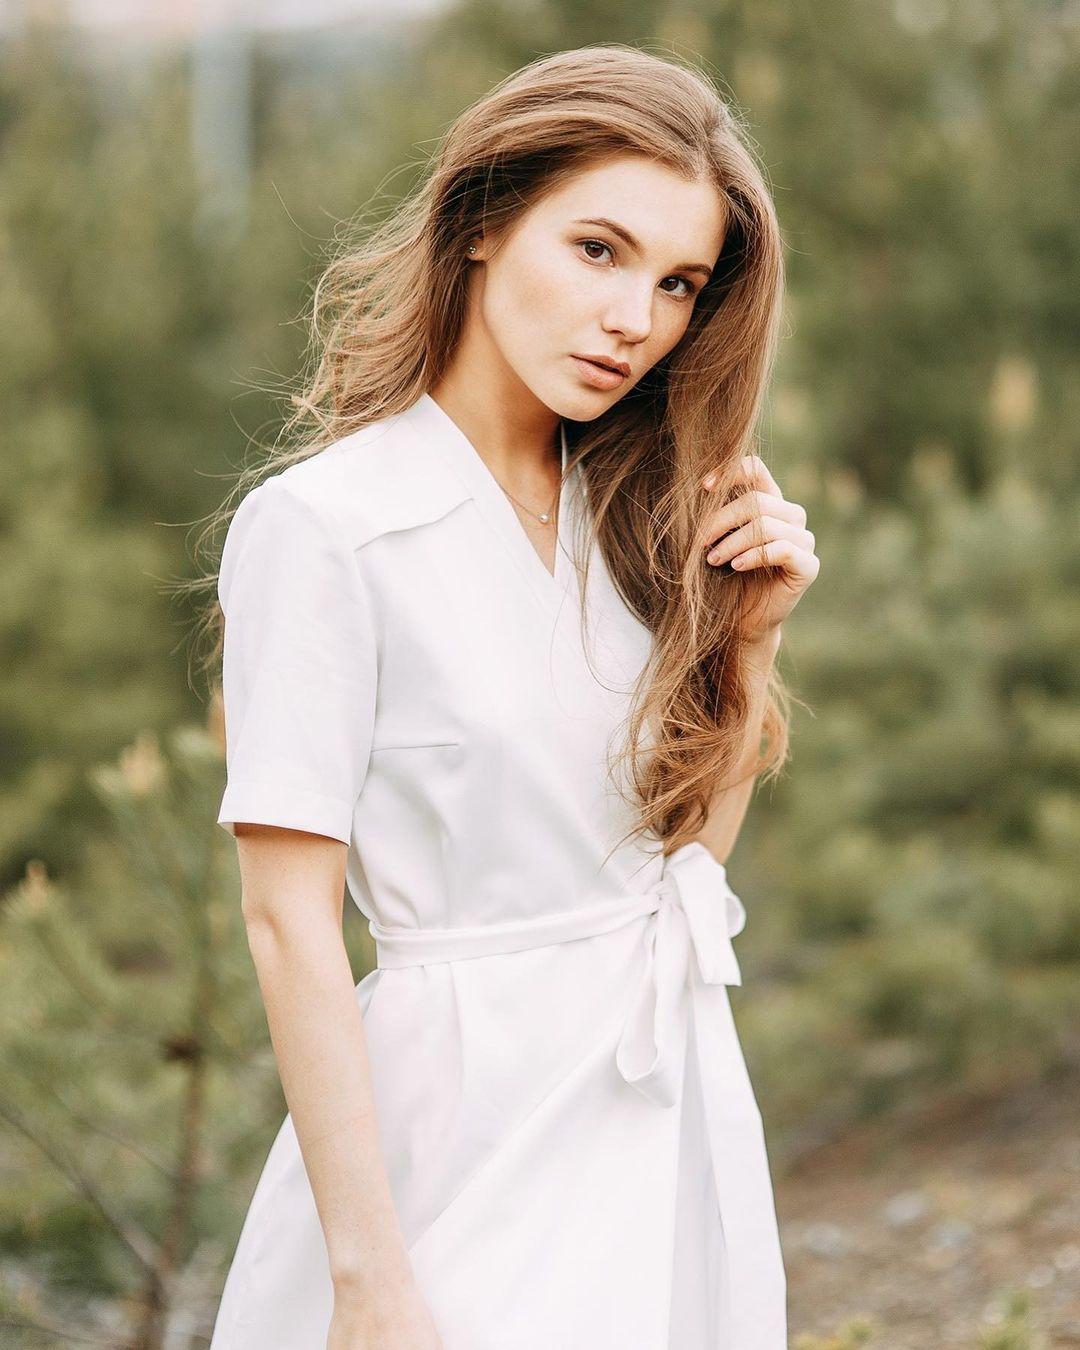 Anna-Kudinova-Wallpapers-Insta-Fit-Bio-6